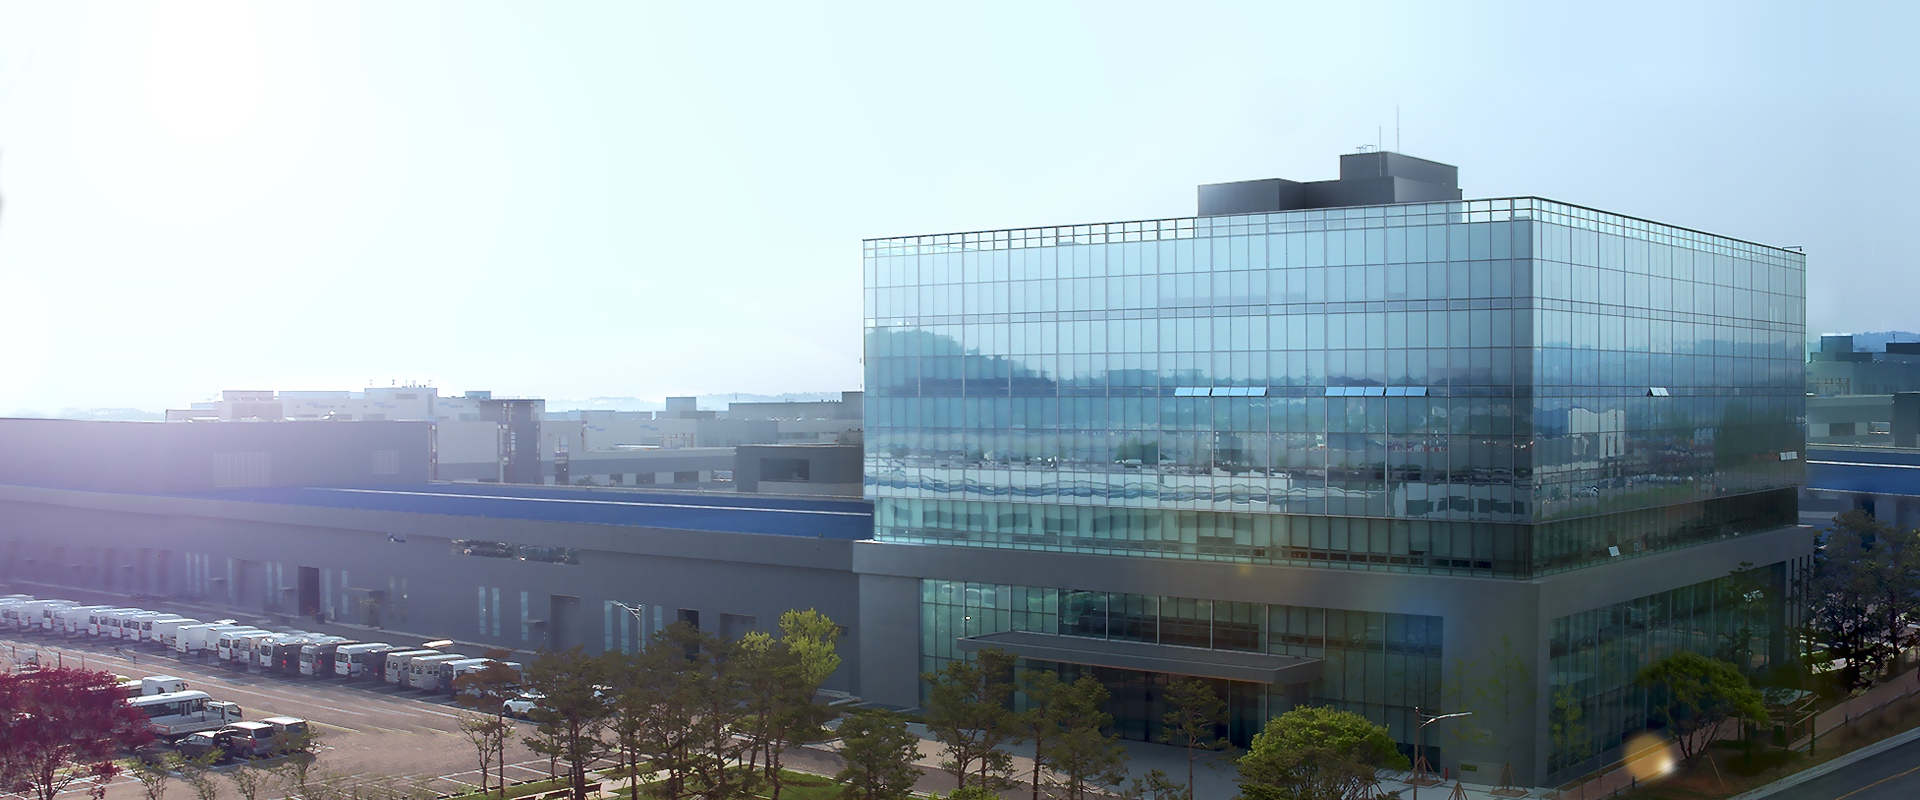 R&D Center and Design Center